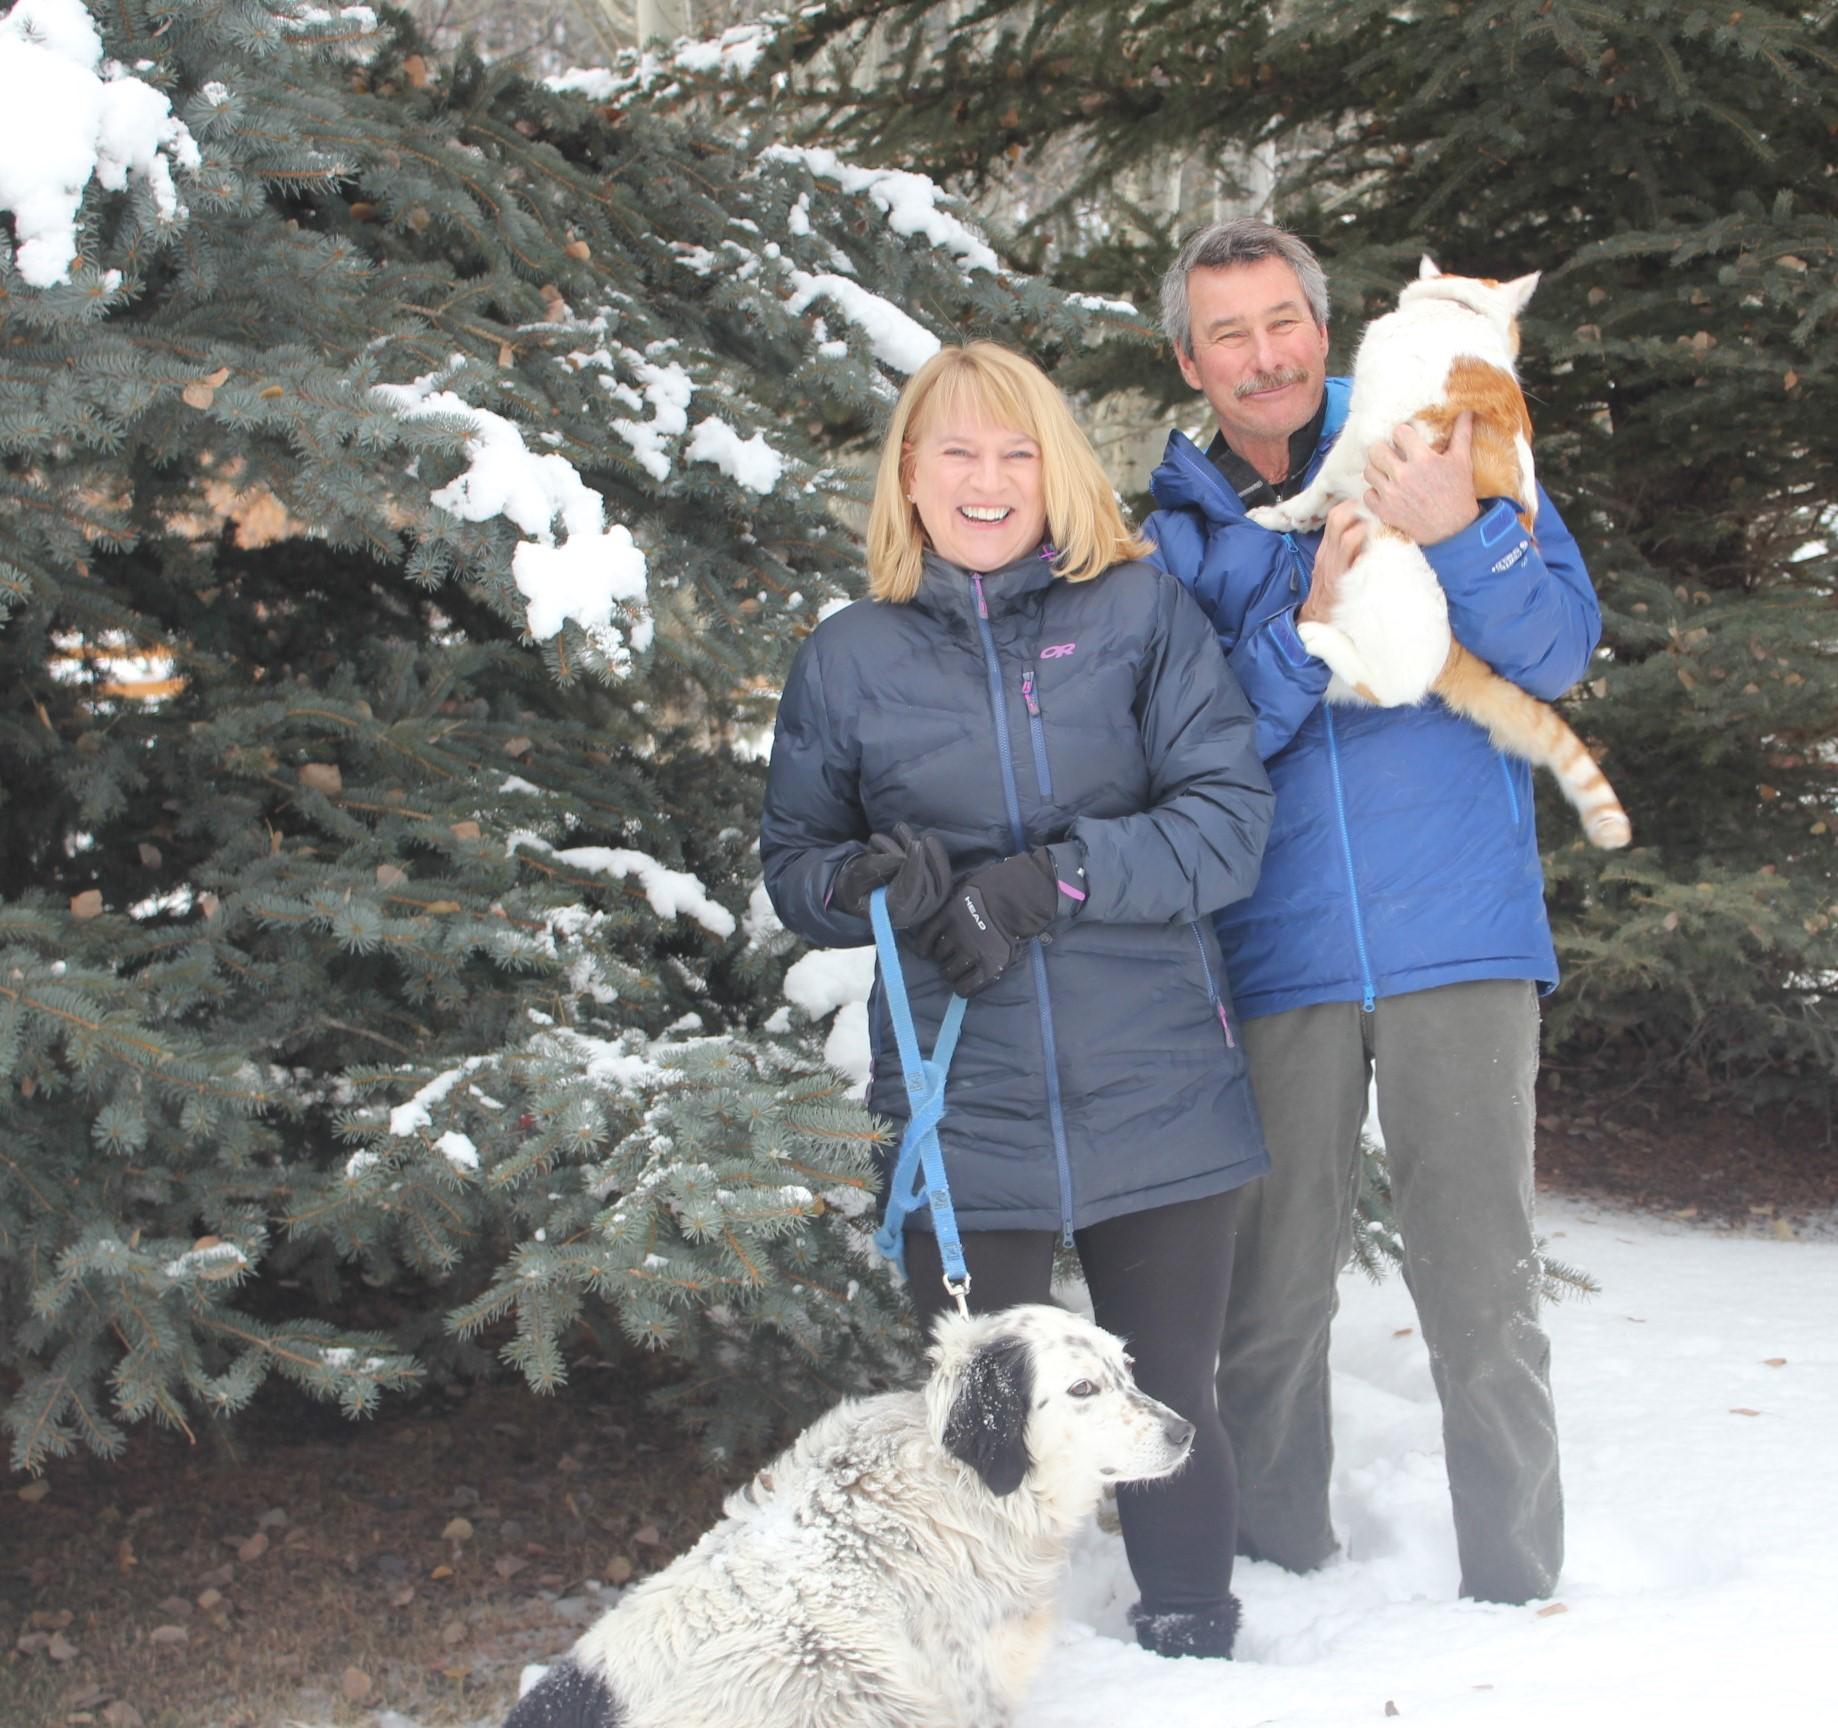 Sheila Liermann sends Merry Christmas greetings